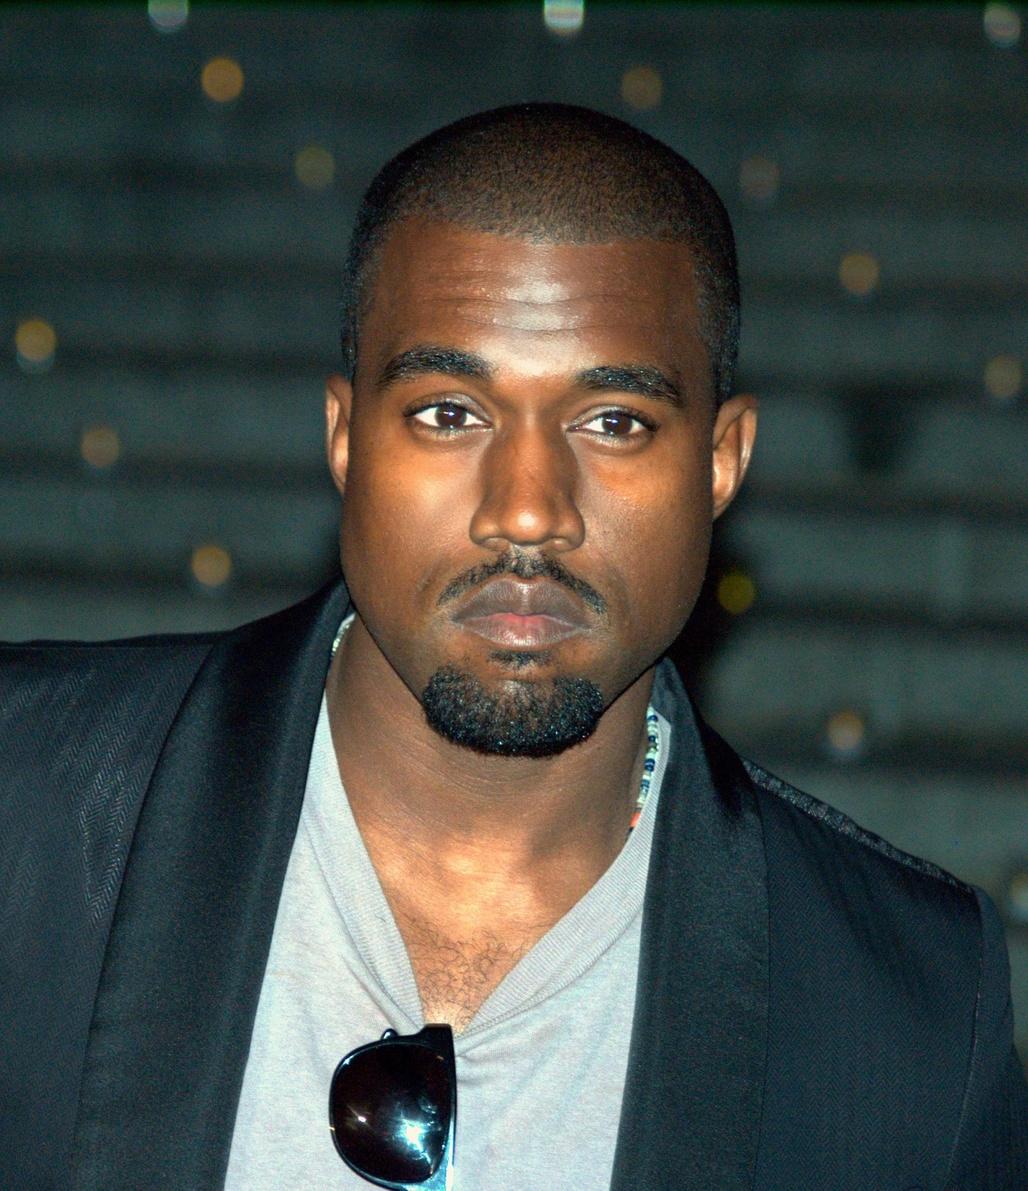 Kanye West. Image via Wikipedia.